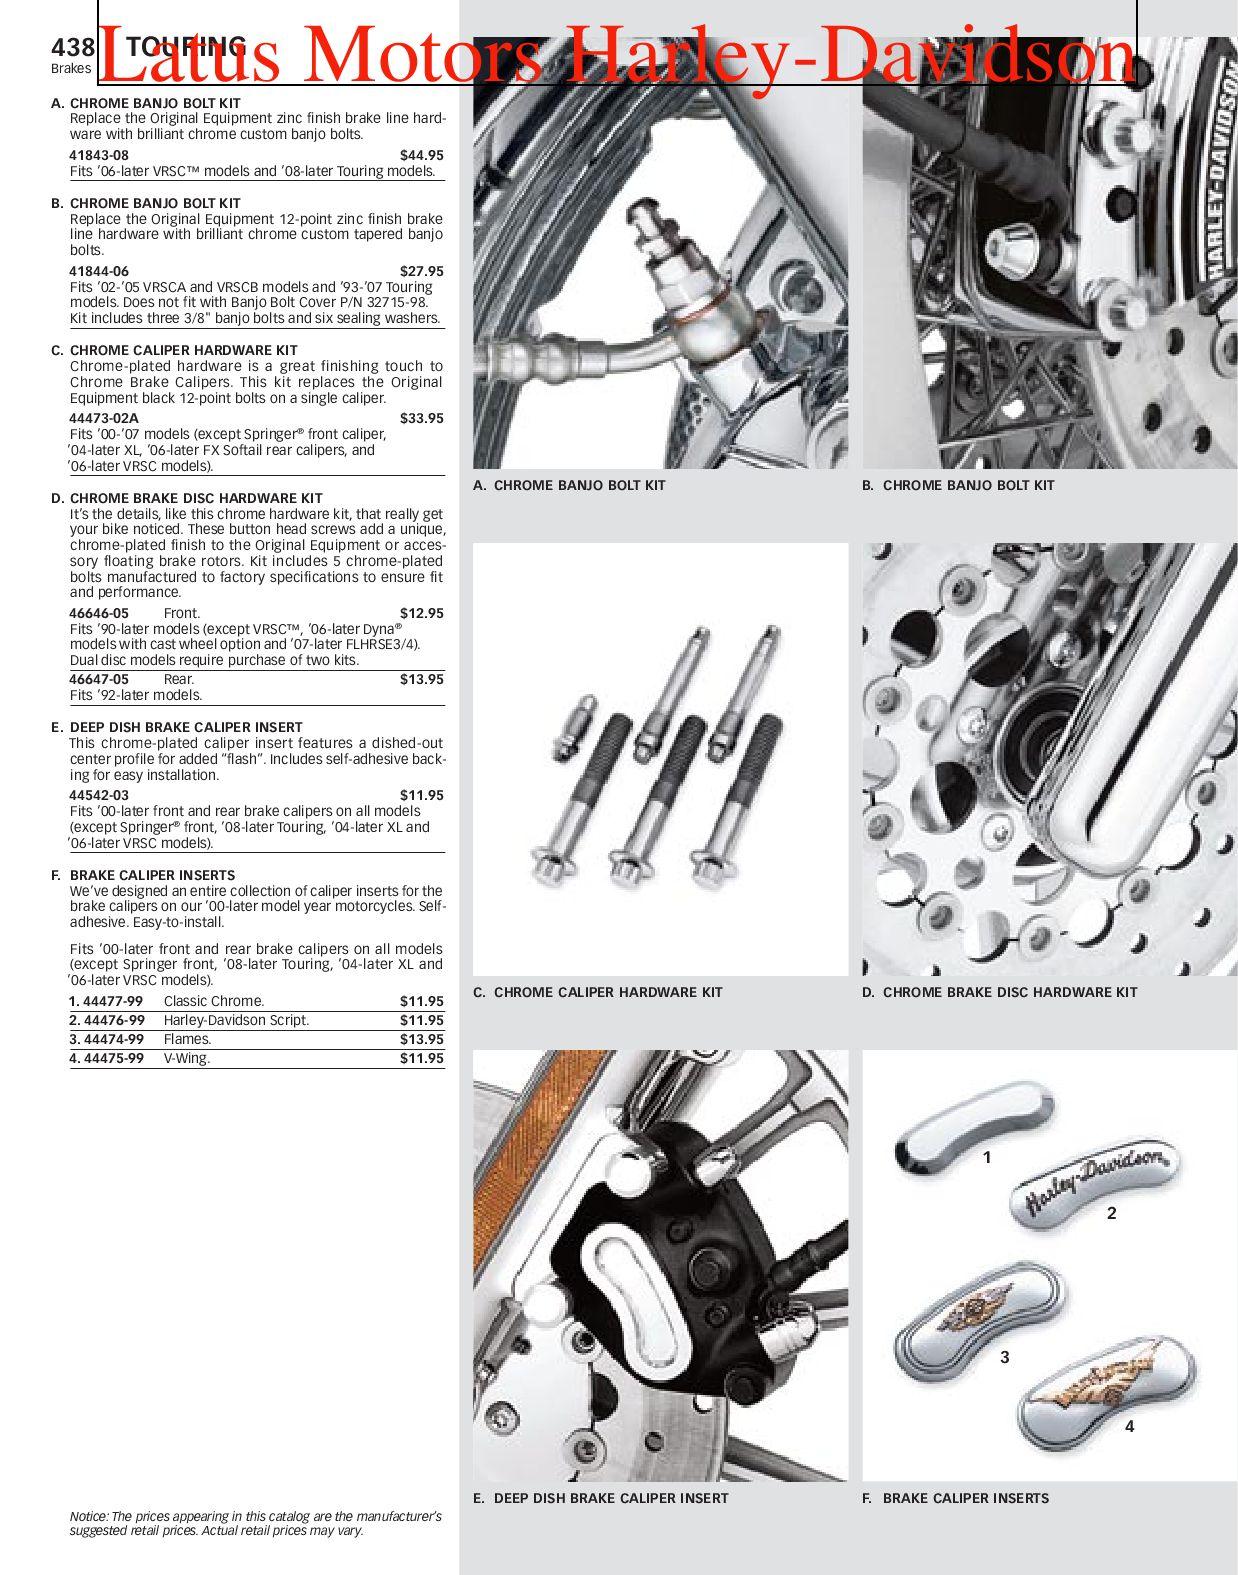 Harley Brake Line Banjo Bolt 3//8 x 24 Thread Allen Style Chrome Colony 2191-3